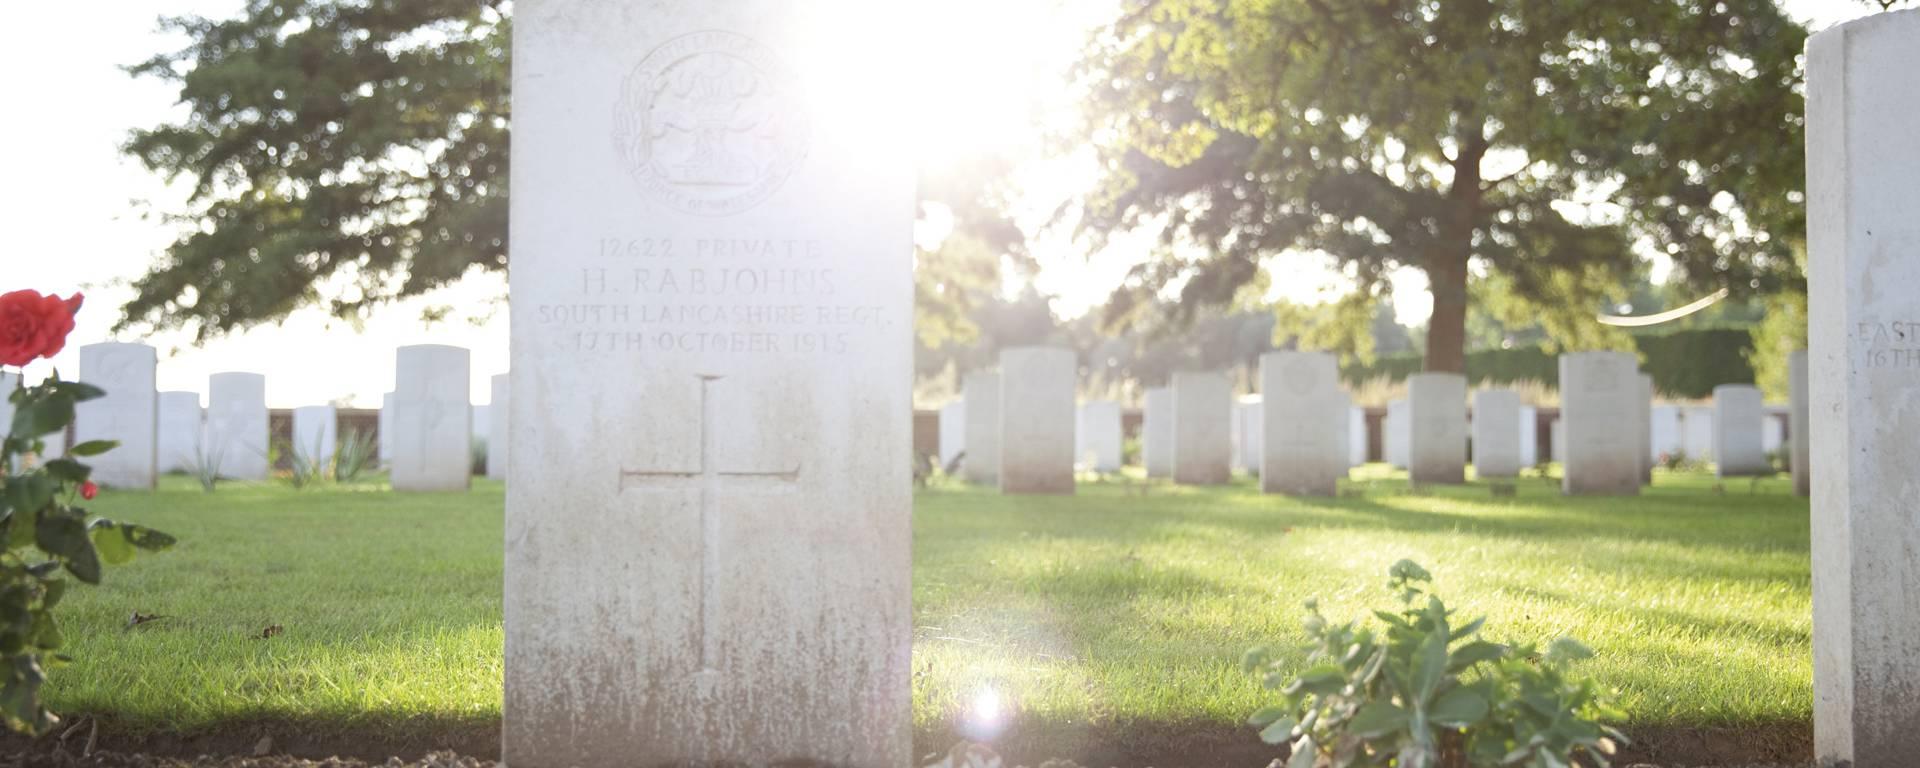 Le Touret Military Cemetery and Memorial - Richebourg © Brigitte Baudesson